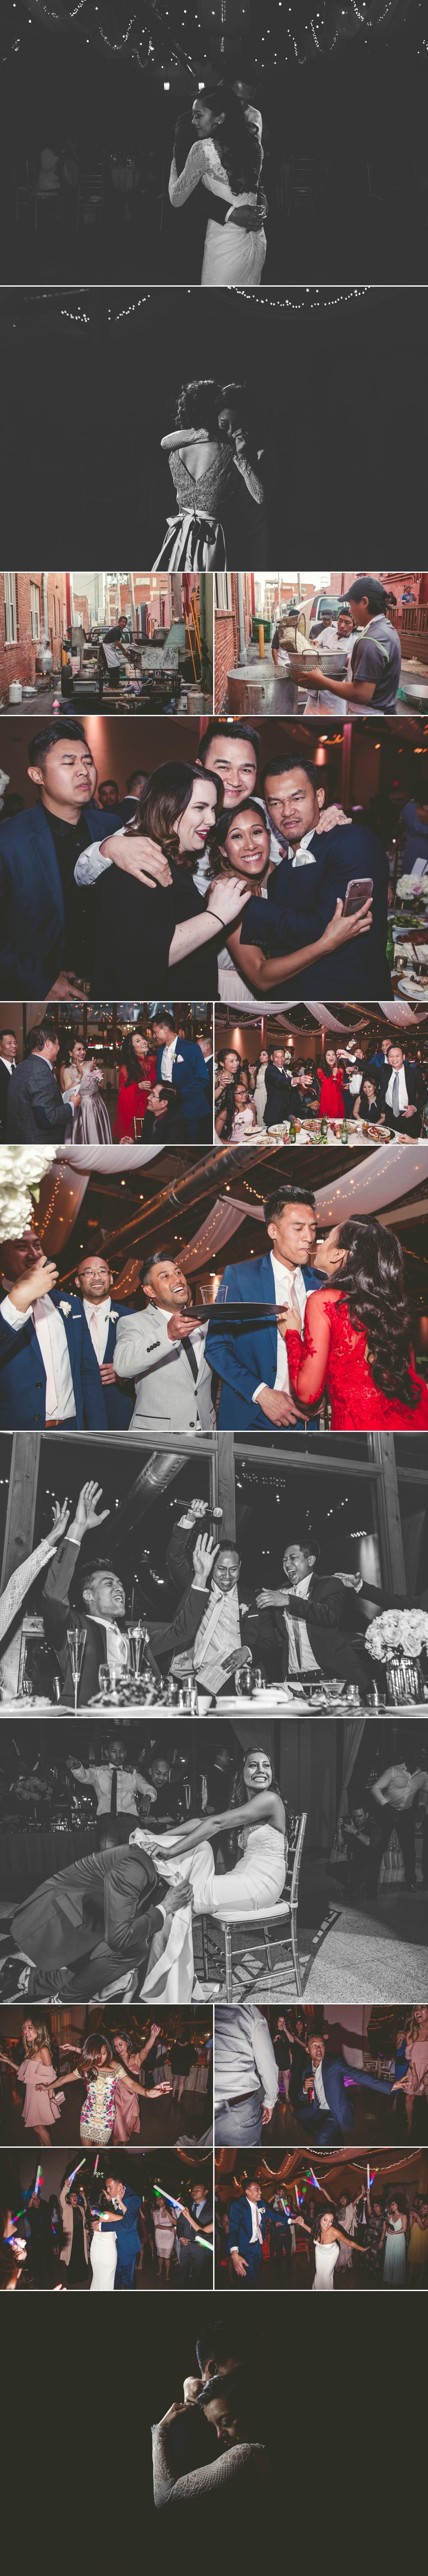 jason_domingues_photography_best_kansas_city_wedding_photographer_kc_weddings_loose_park_monarch_room_0004